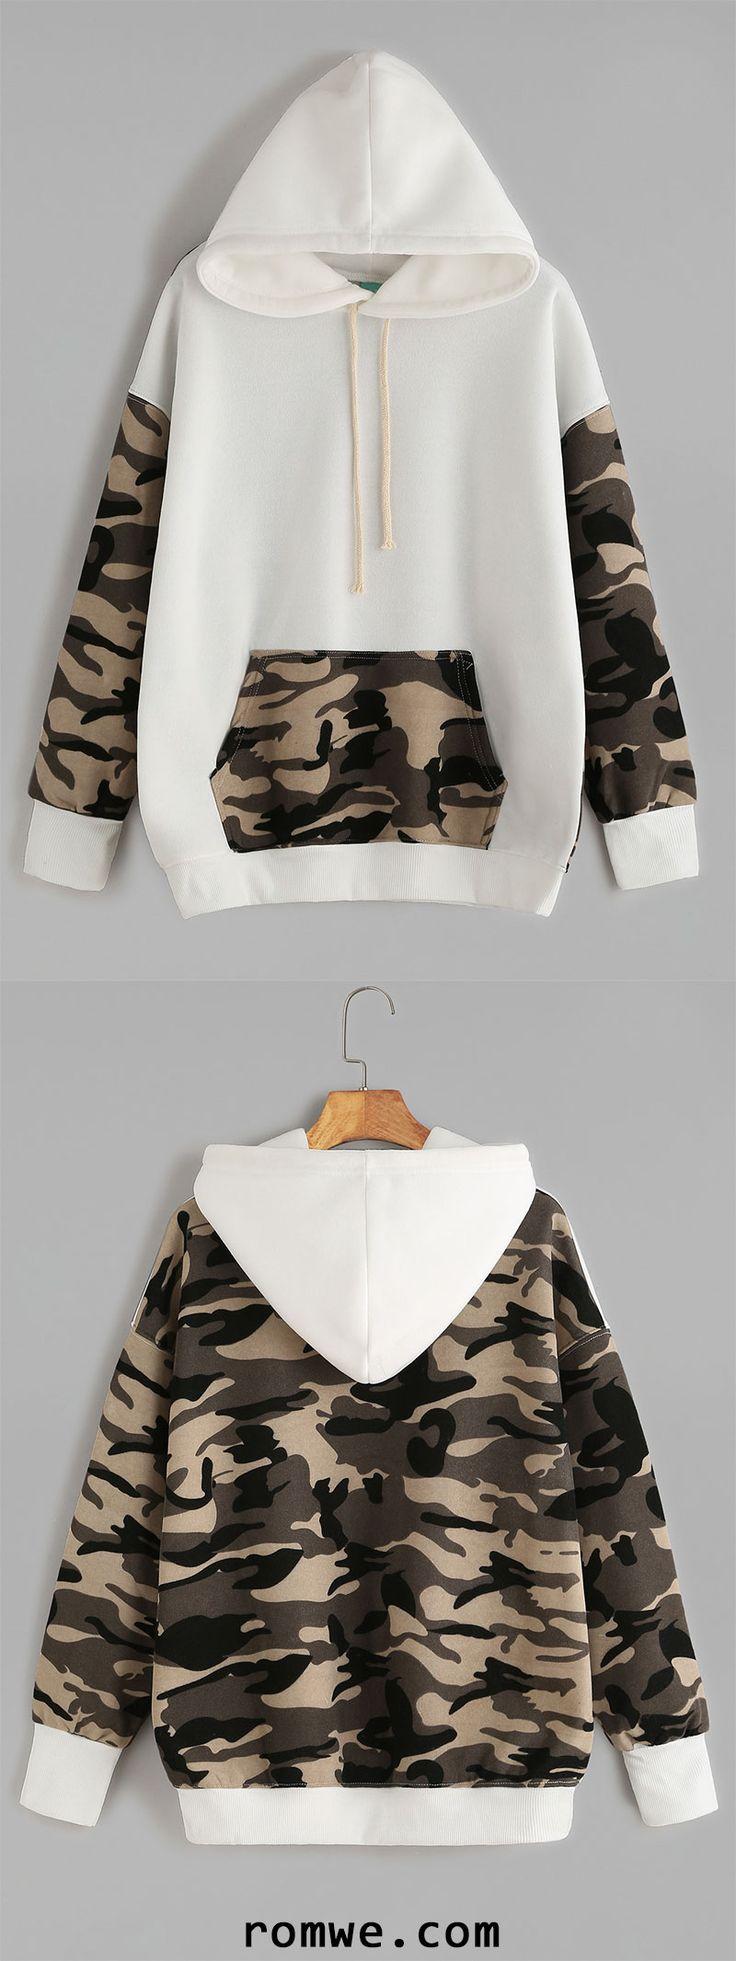 Beige Contrast Camo Print Drawstring Hooded Pocket Sweatshirt